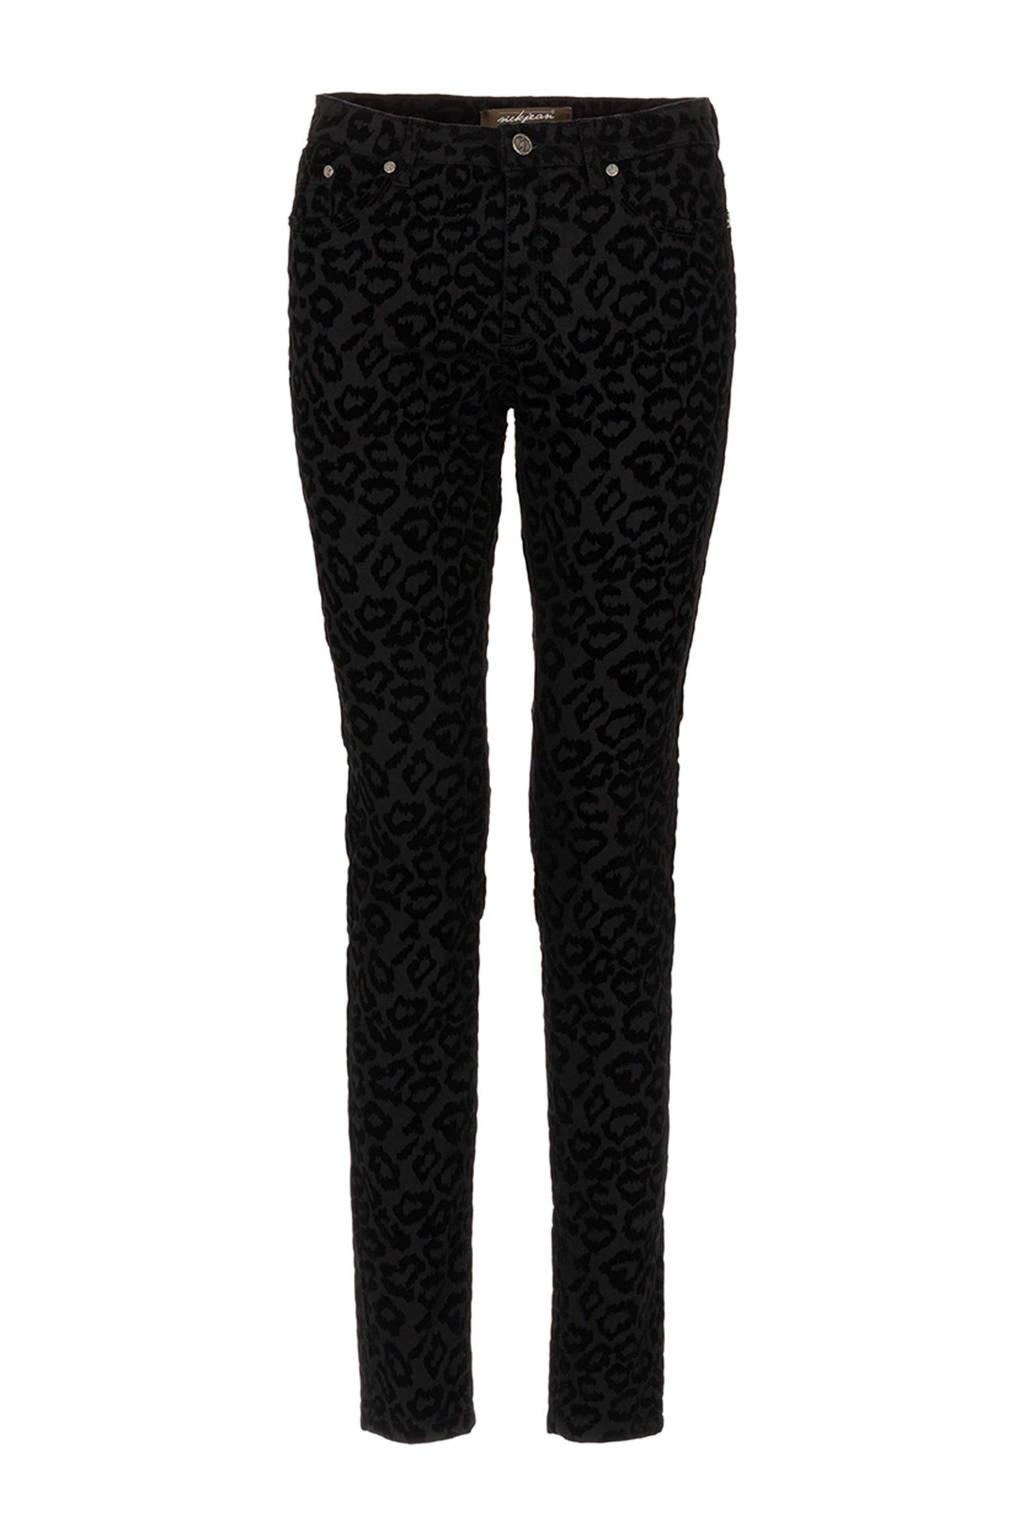 NickJean skinny broek Kathy Flock met panterprint zwart, Zwart